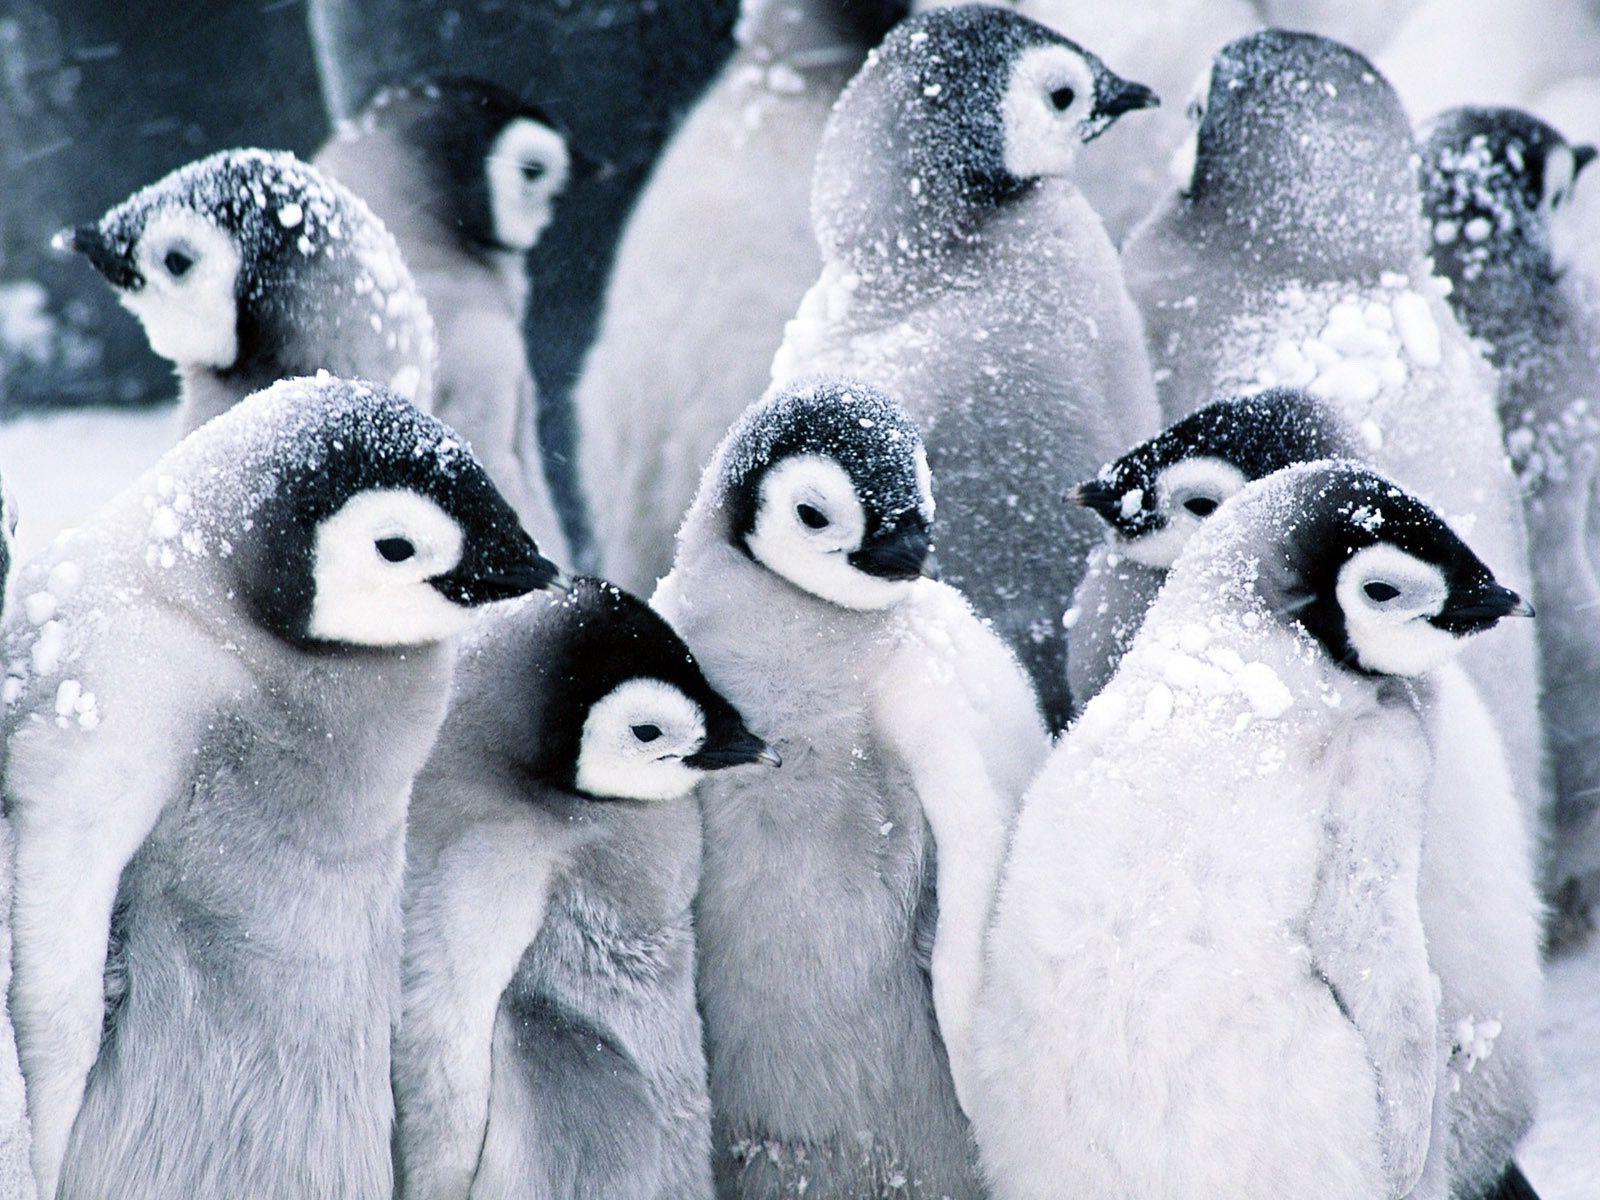 Cute Baby Penguins Wallpaper 1600x1200 45966 Cute Baby Penguin Penguin Wallpaper Baby Penguins